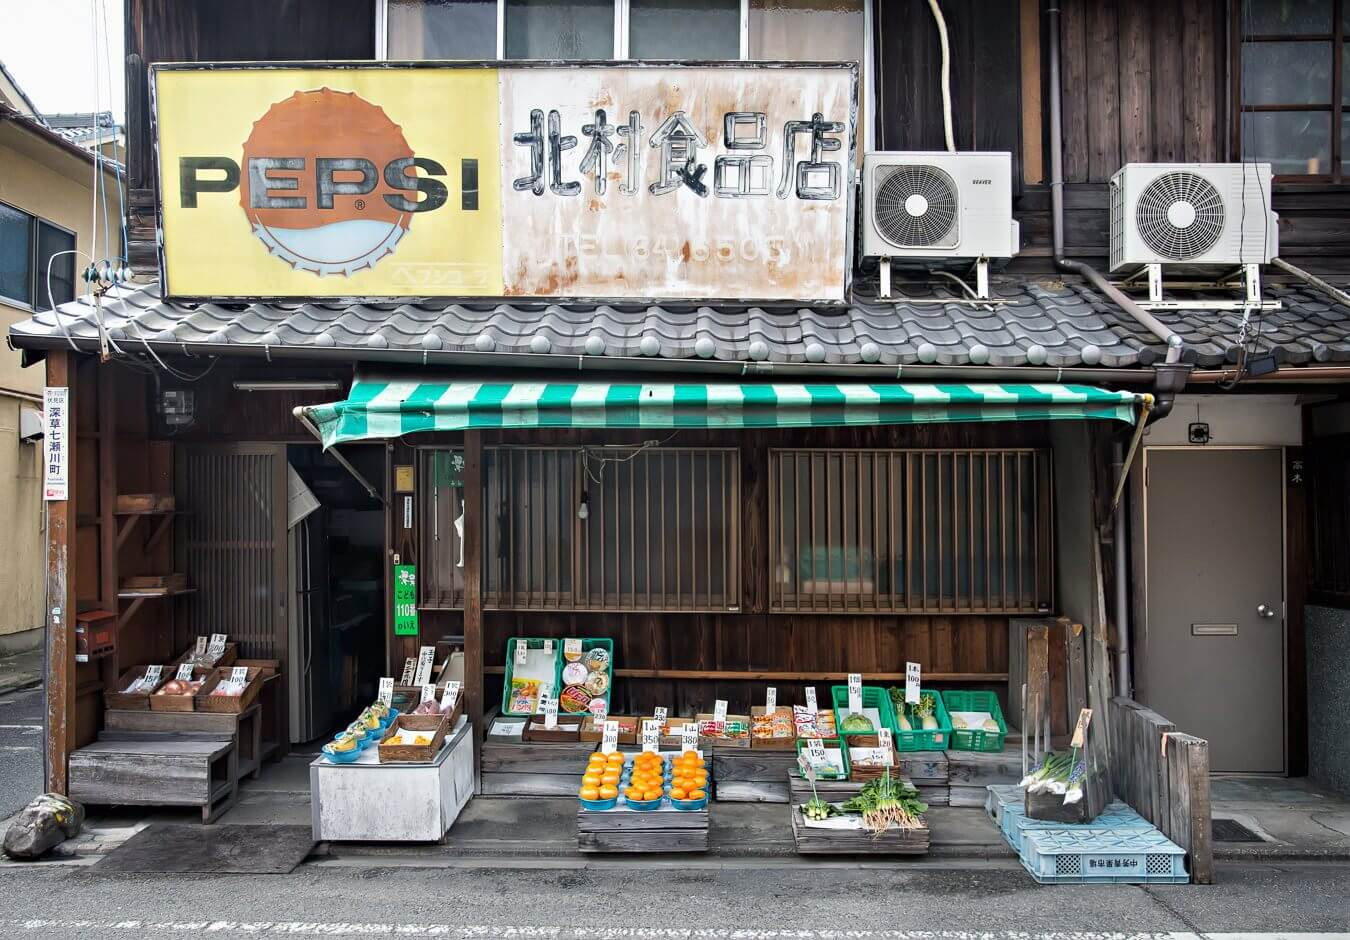 Village store, Kyoto, Japan - Photo by Zed Sindelar of CuriousZed Photography